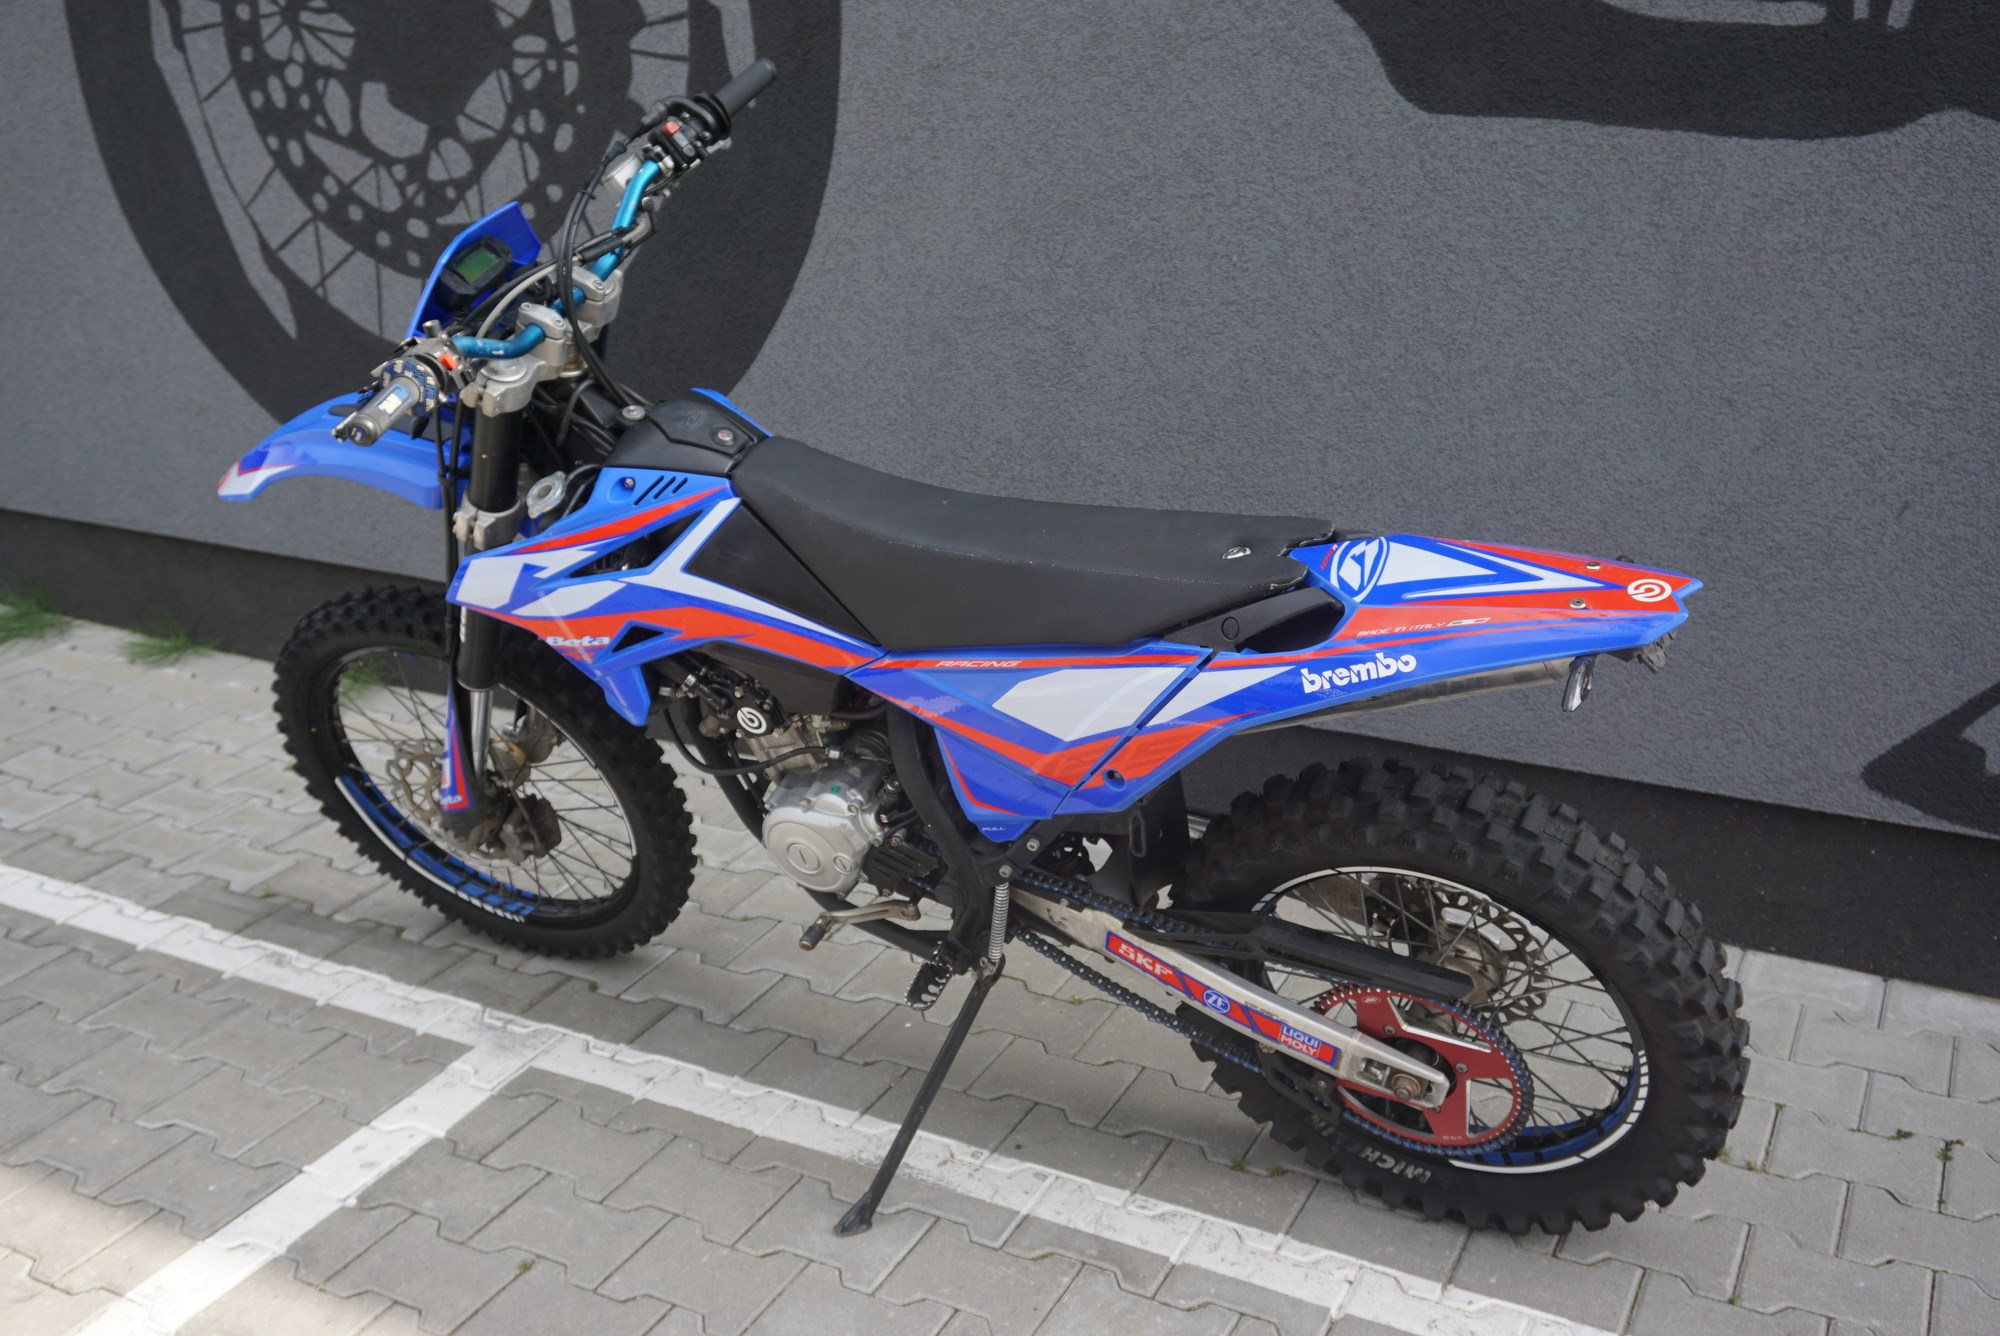 Beta RR 125